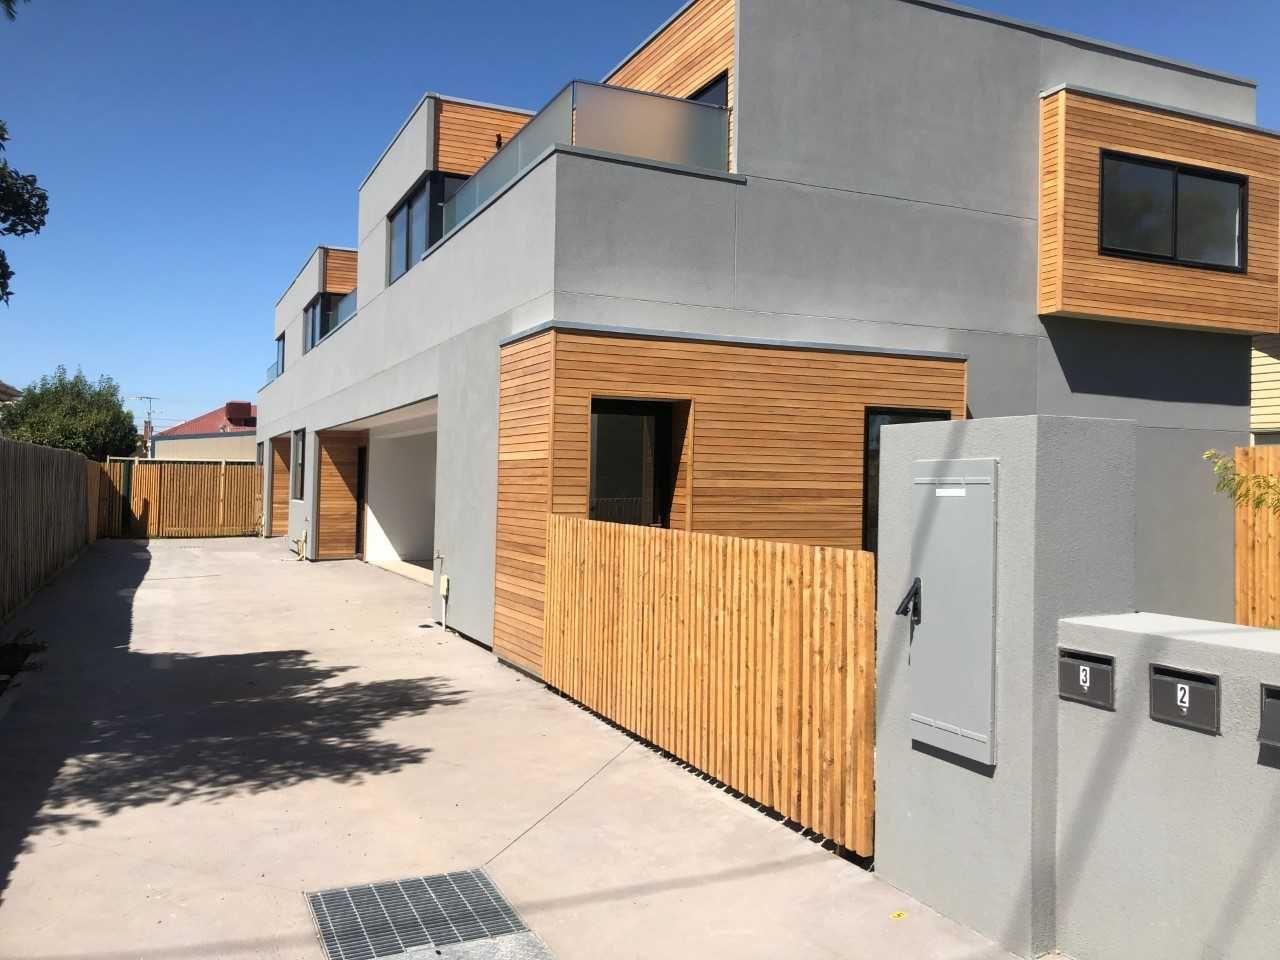 3/529 Ballarat Road, Albion VIC 3020, Image 0